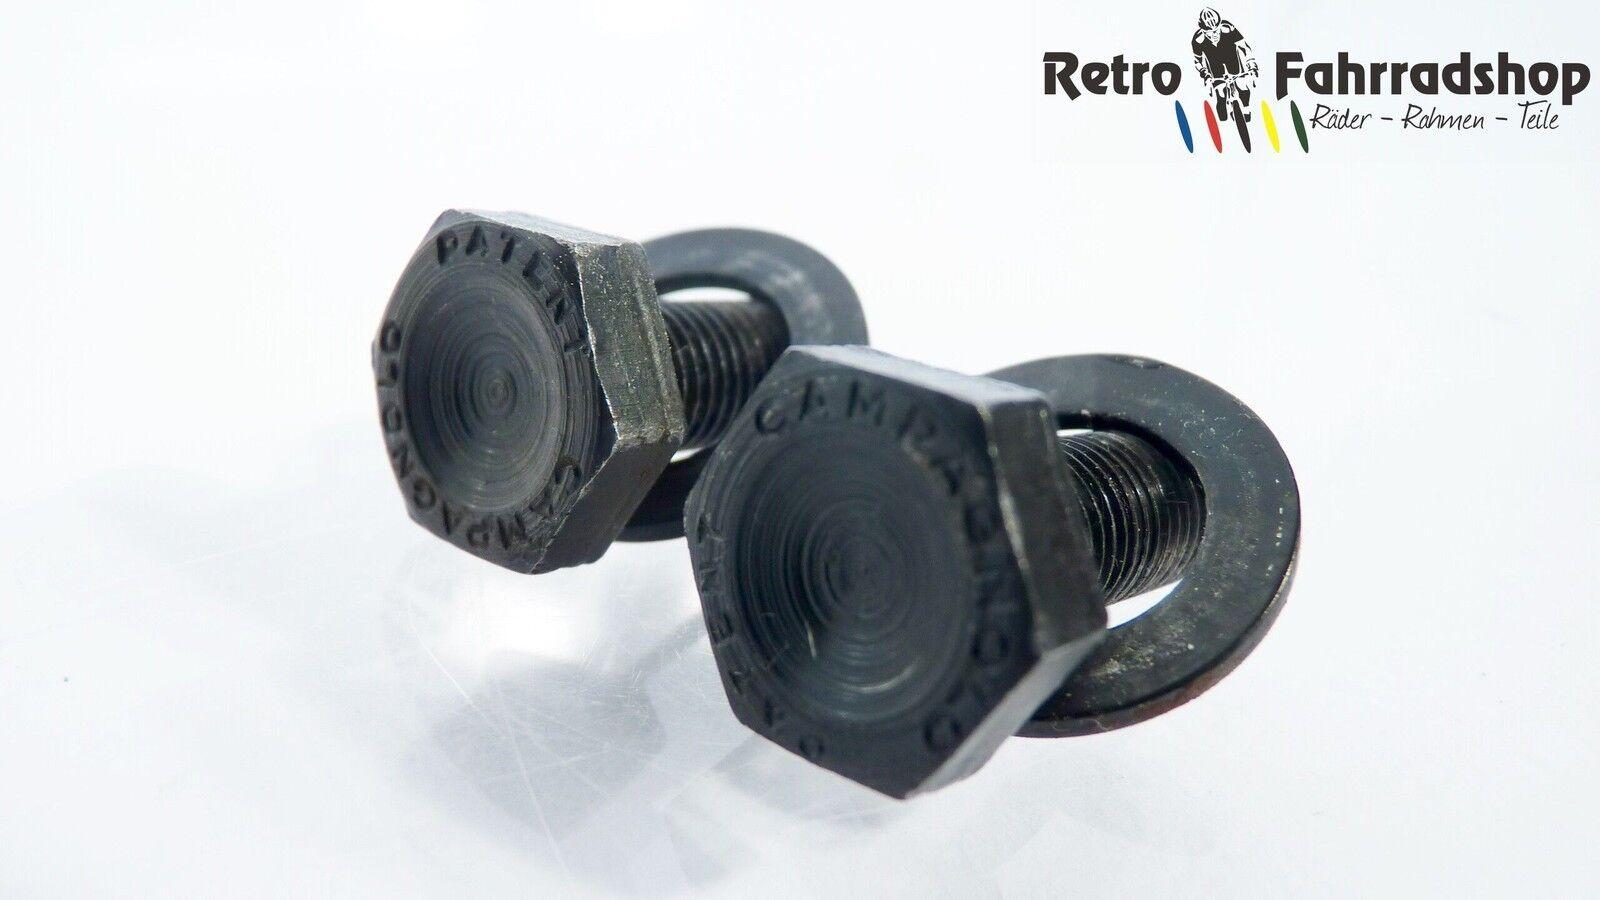 Campagnolo Made in  Original  Kurbelschrauben 1978 Retro RAR Vintage 32g P.